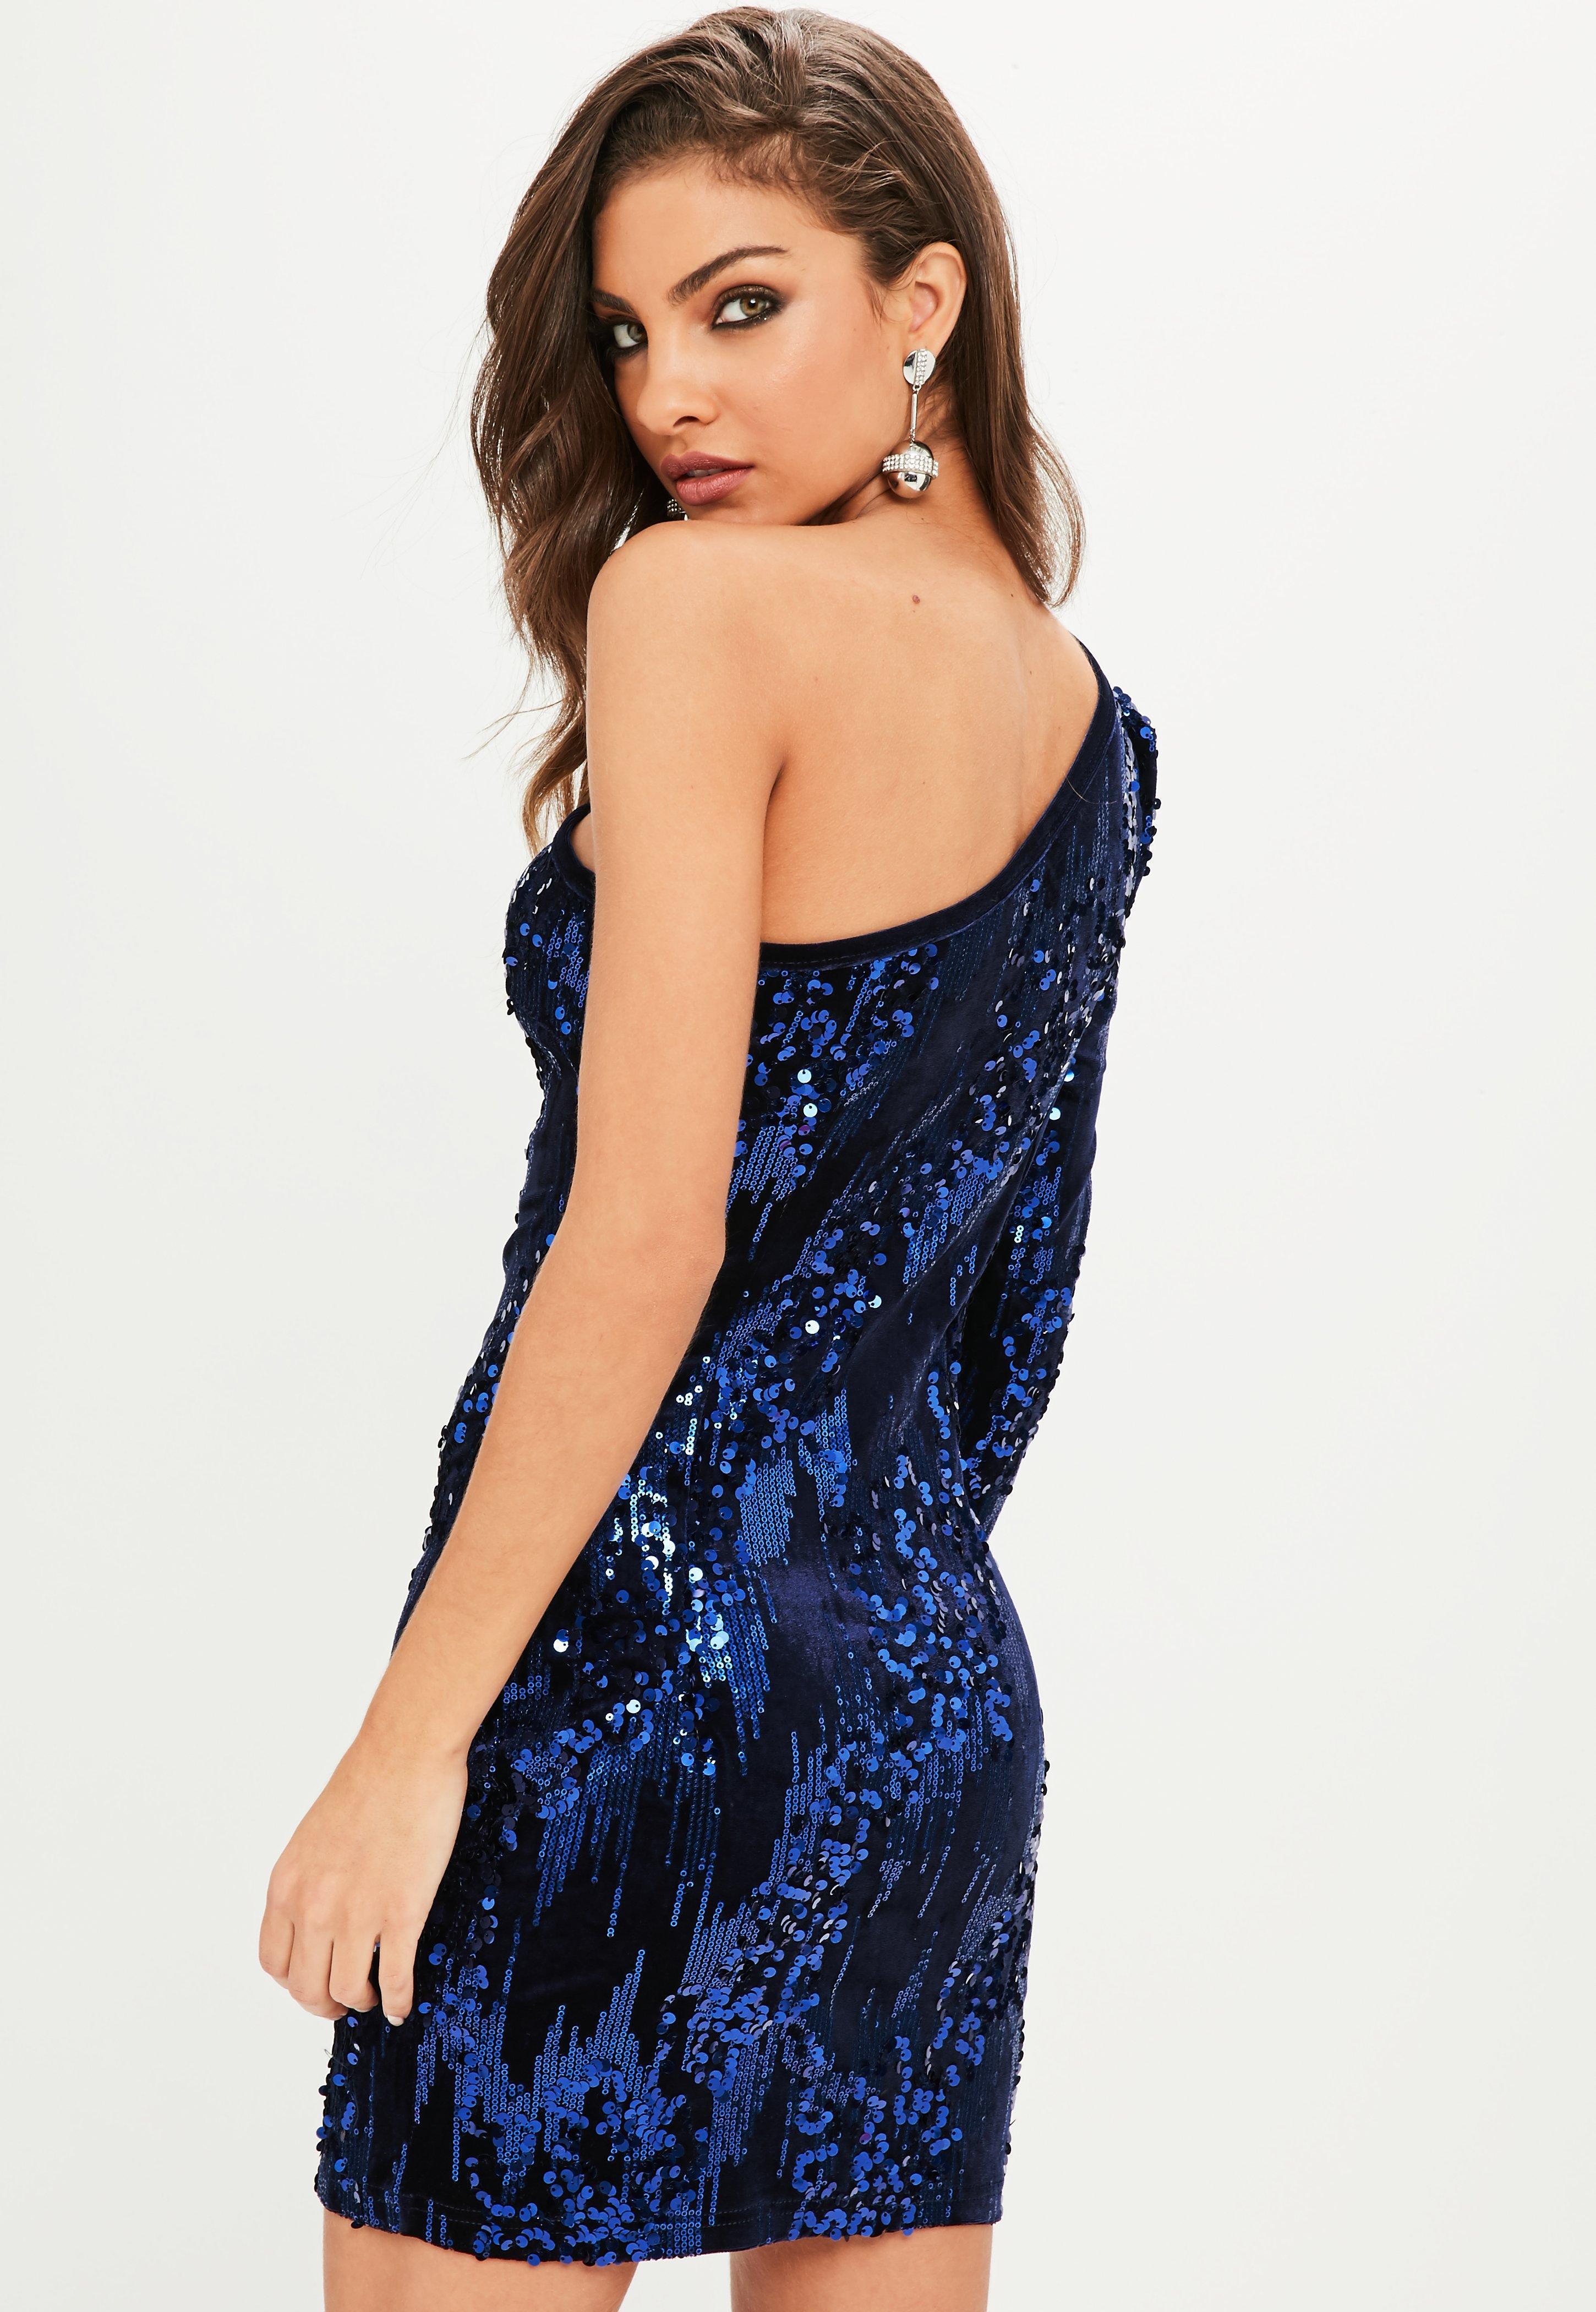 Hilaria navy blue sequin bodycon mini dress